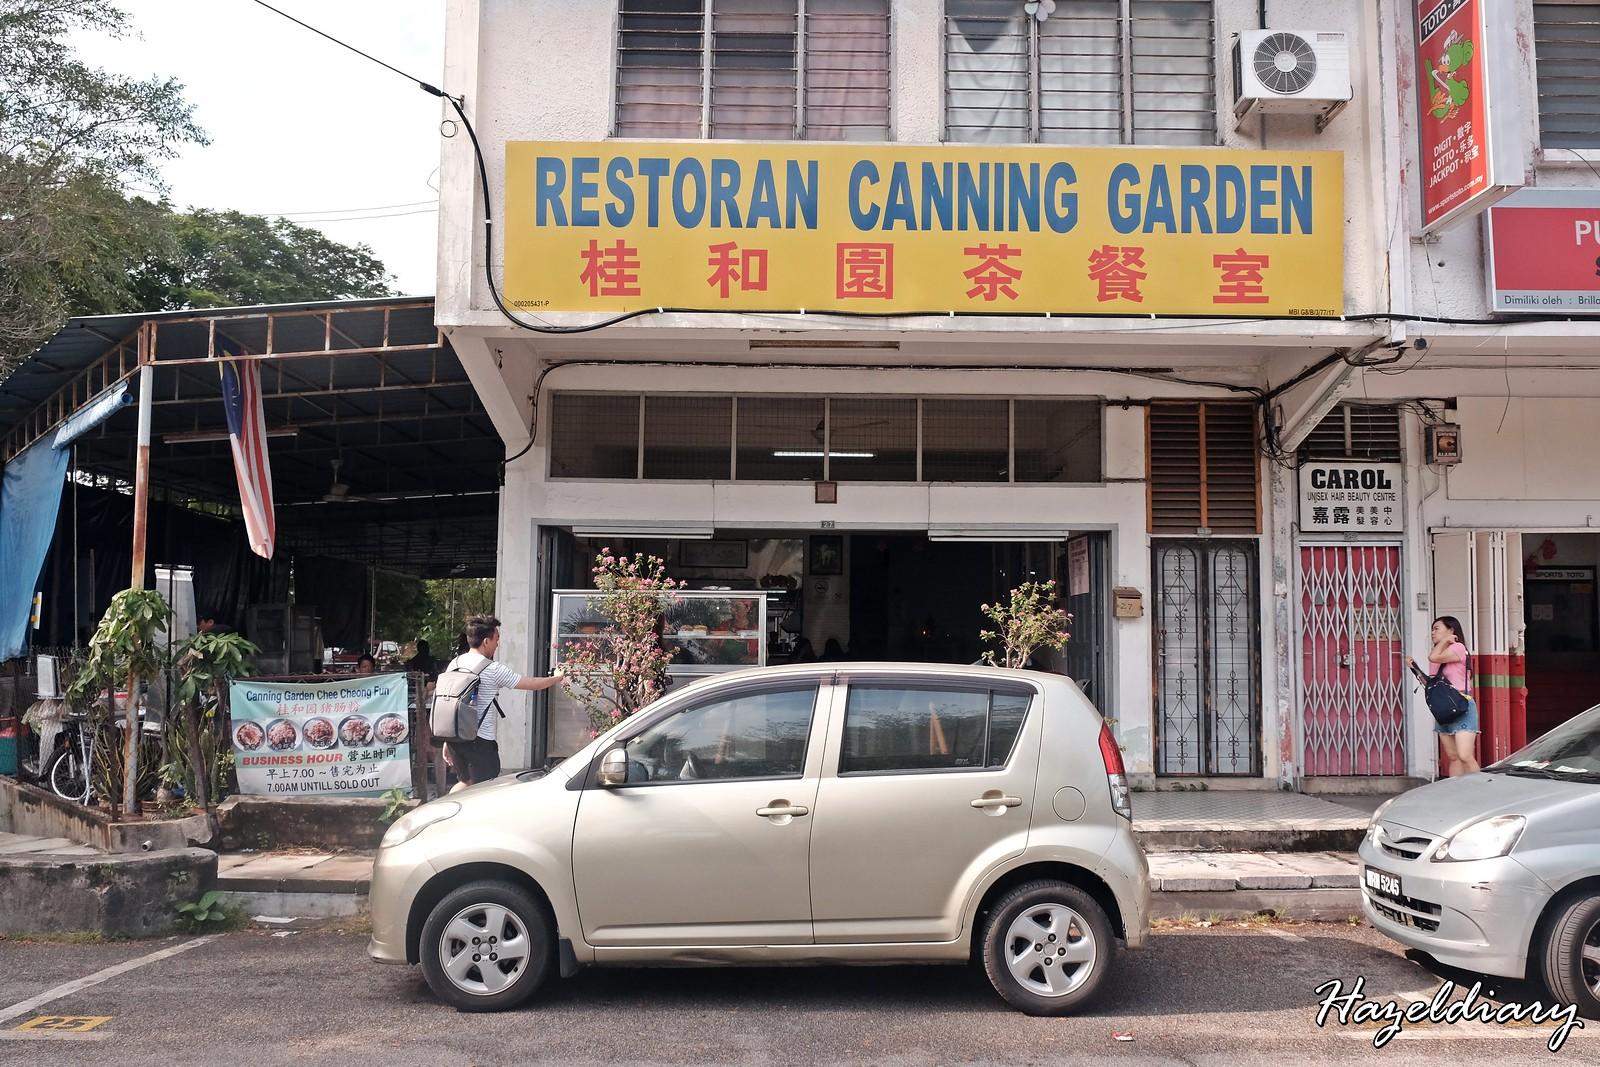 Restoran Canning Garden-Hazeldiary